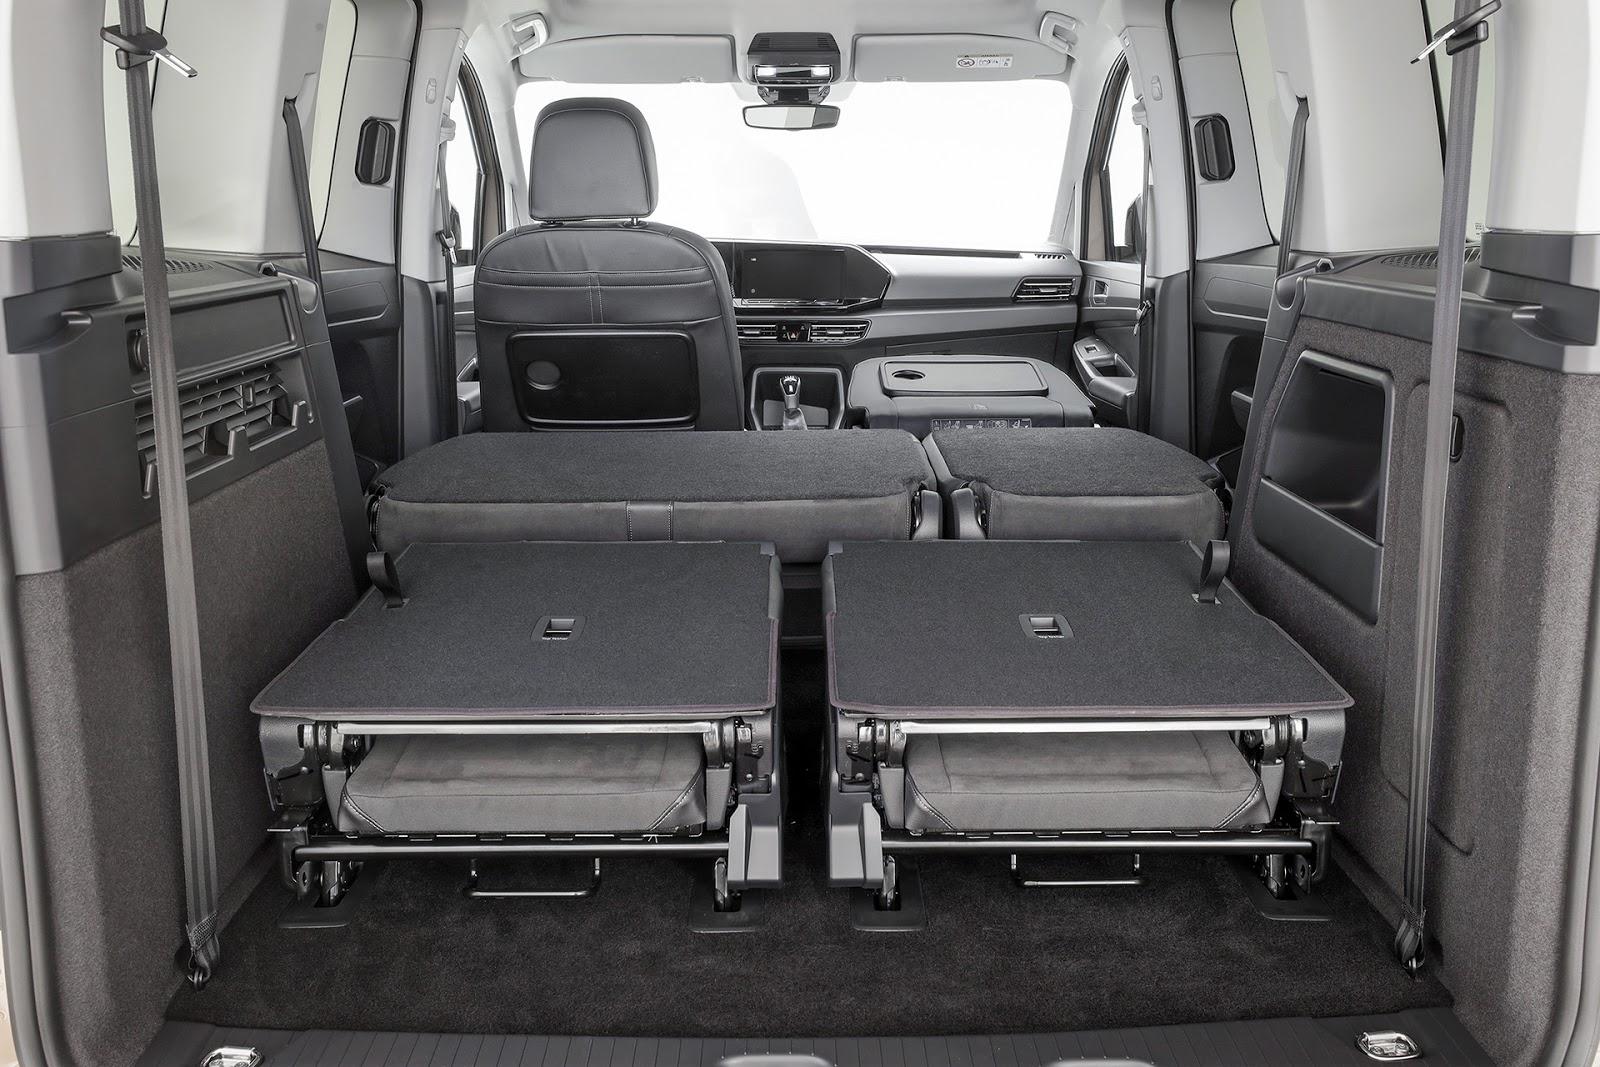 NEO2BVOLKSWAGEN2BCADDY2B5 10 Νέο Volkswagen Caddy 5: μεγαλύτερο, πρακτικότερο, αποδοτικότερο, εξυπνότερο Caddy, MPV, Volkswagen, Volkswagen Caddy, VW, VW Caddy, ειδήσεις, Επαγγελματικά